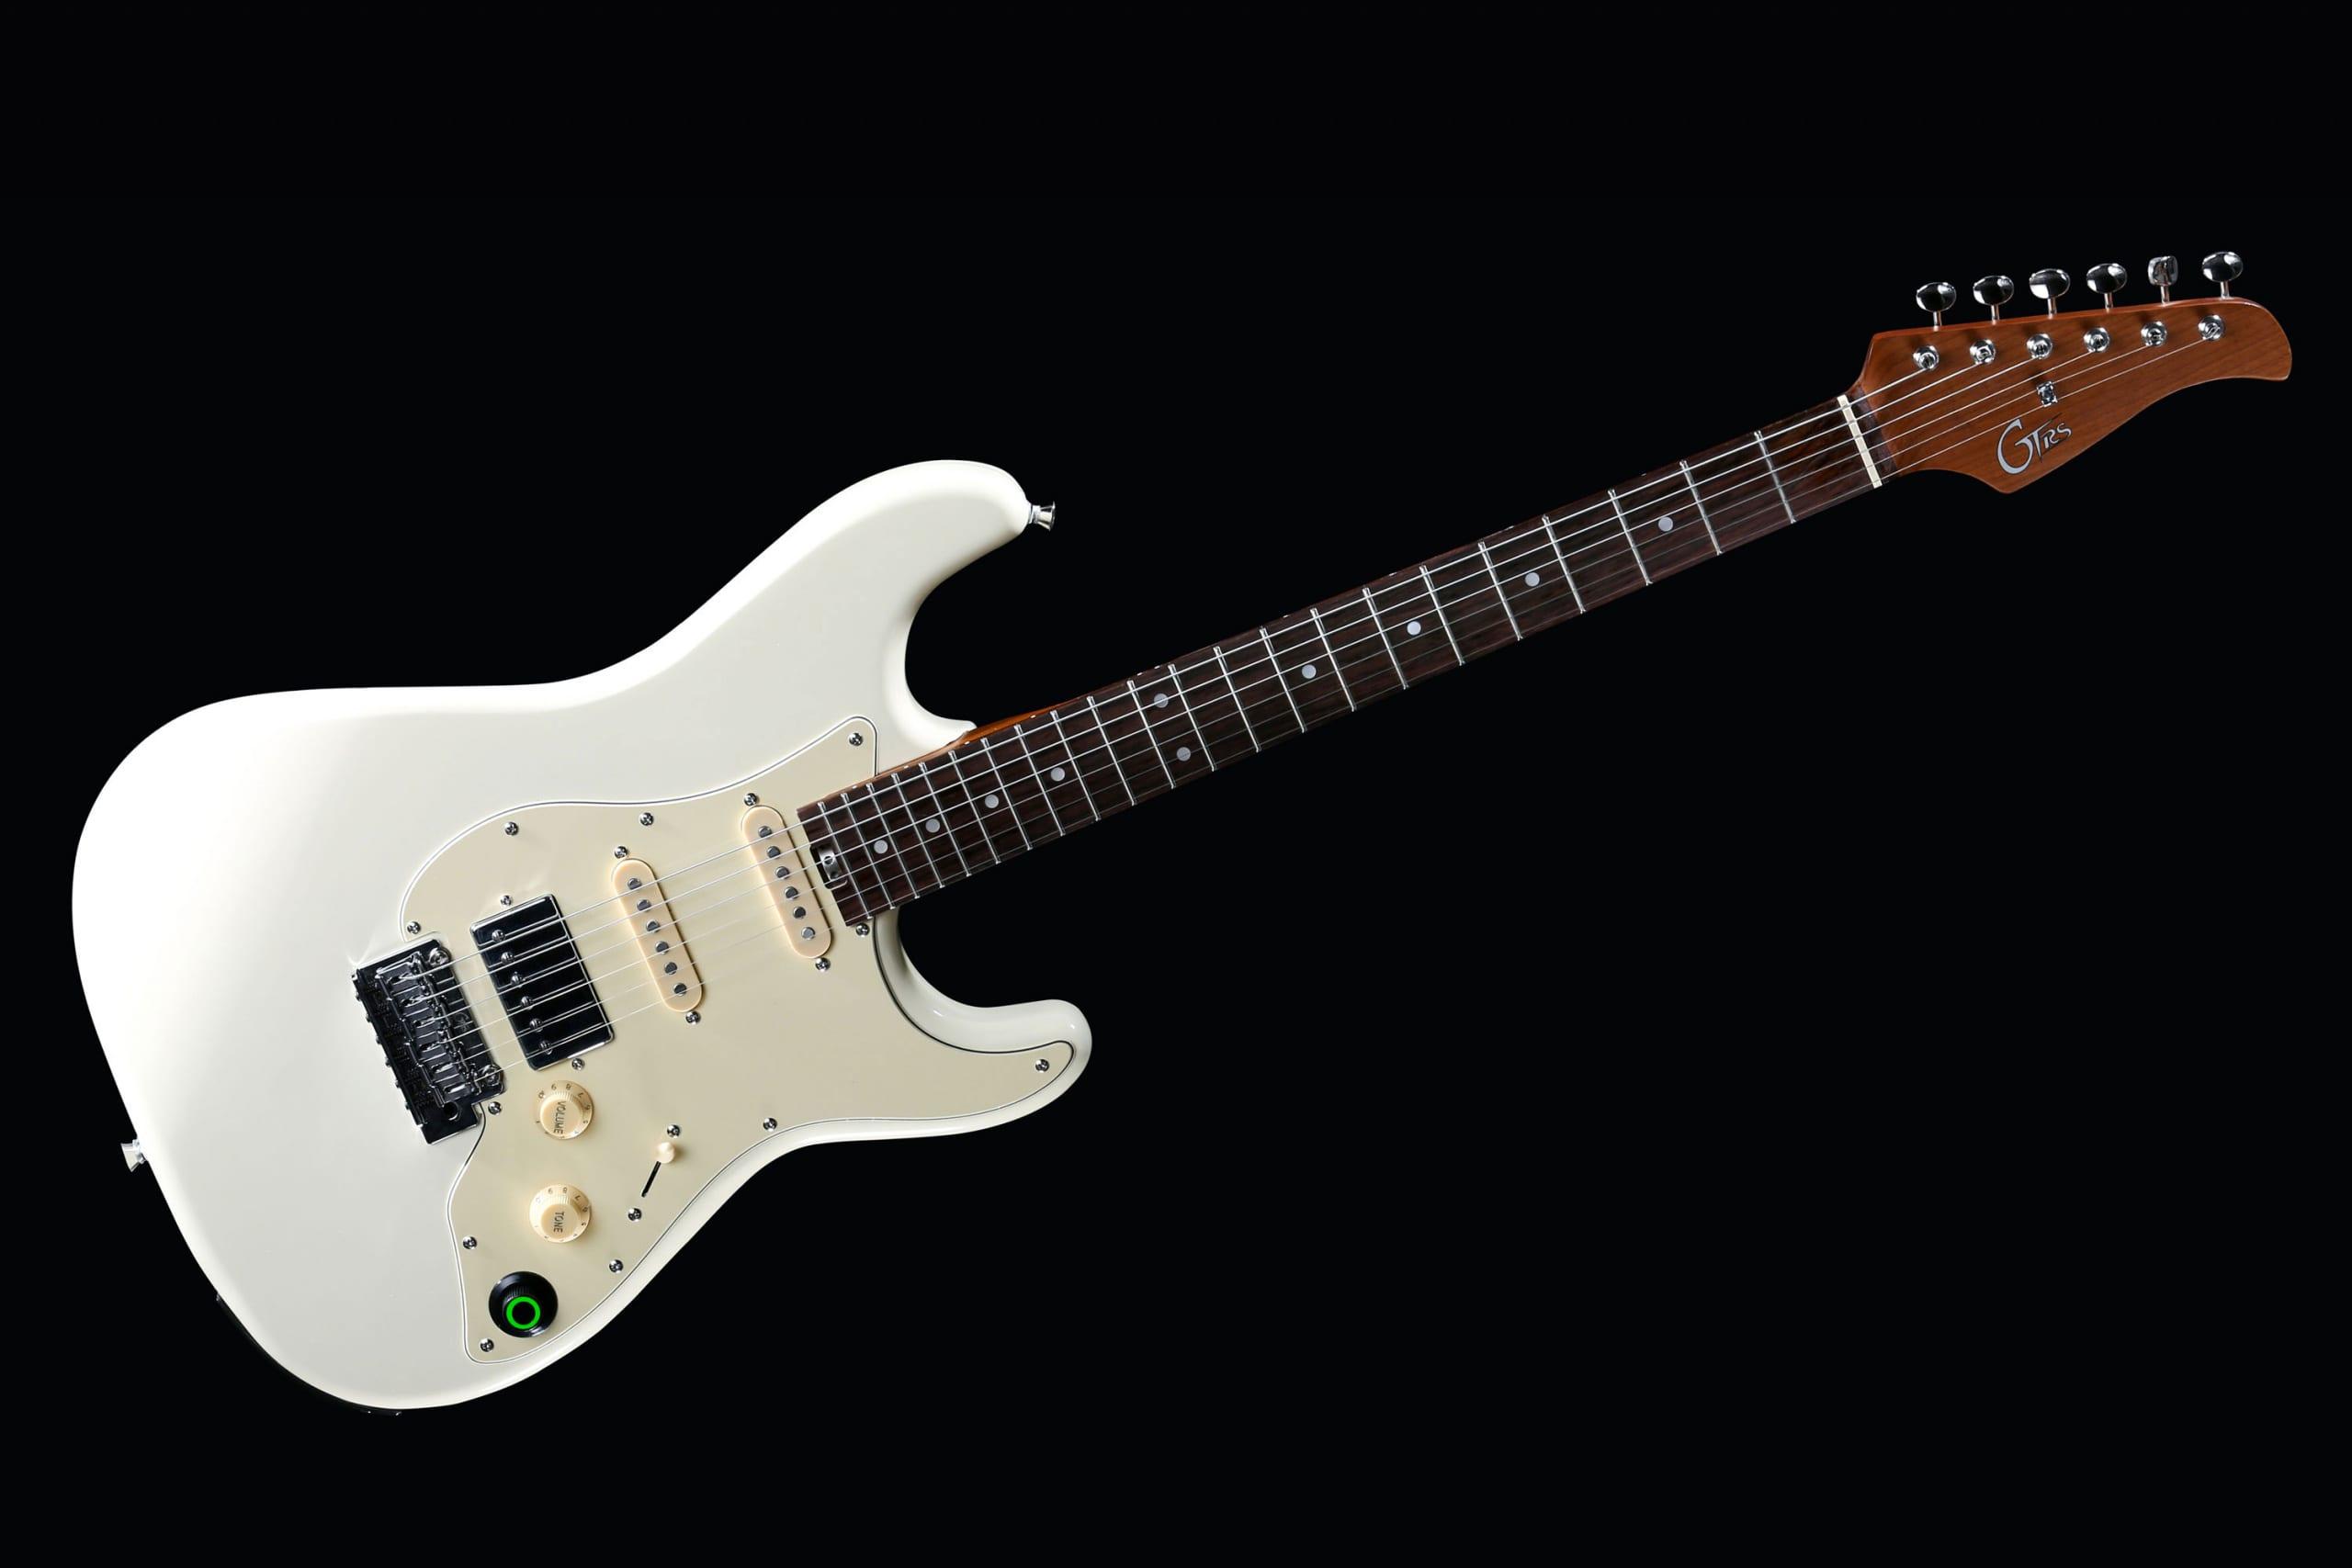 GTRS Intelligent Guitars